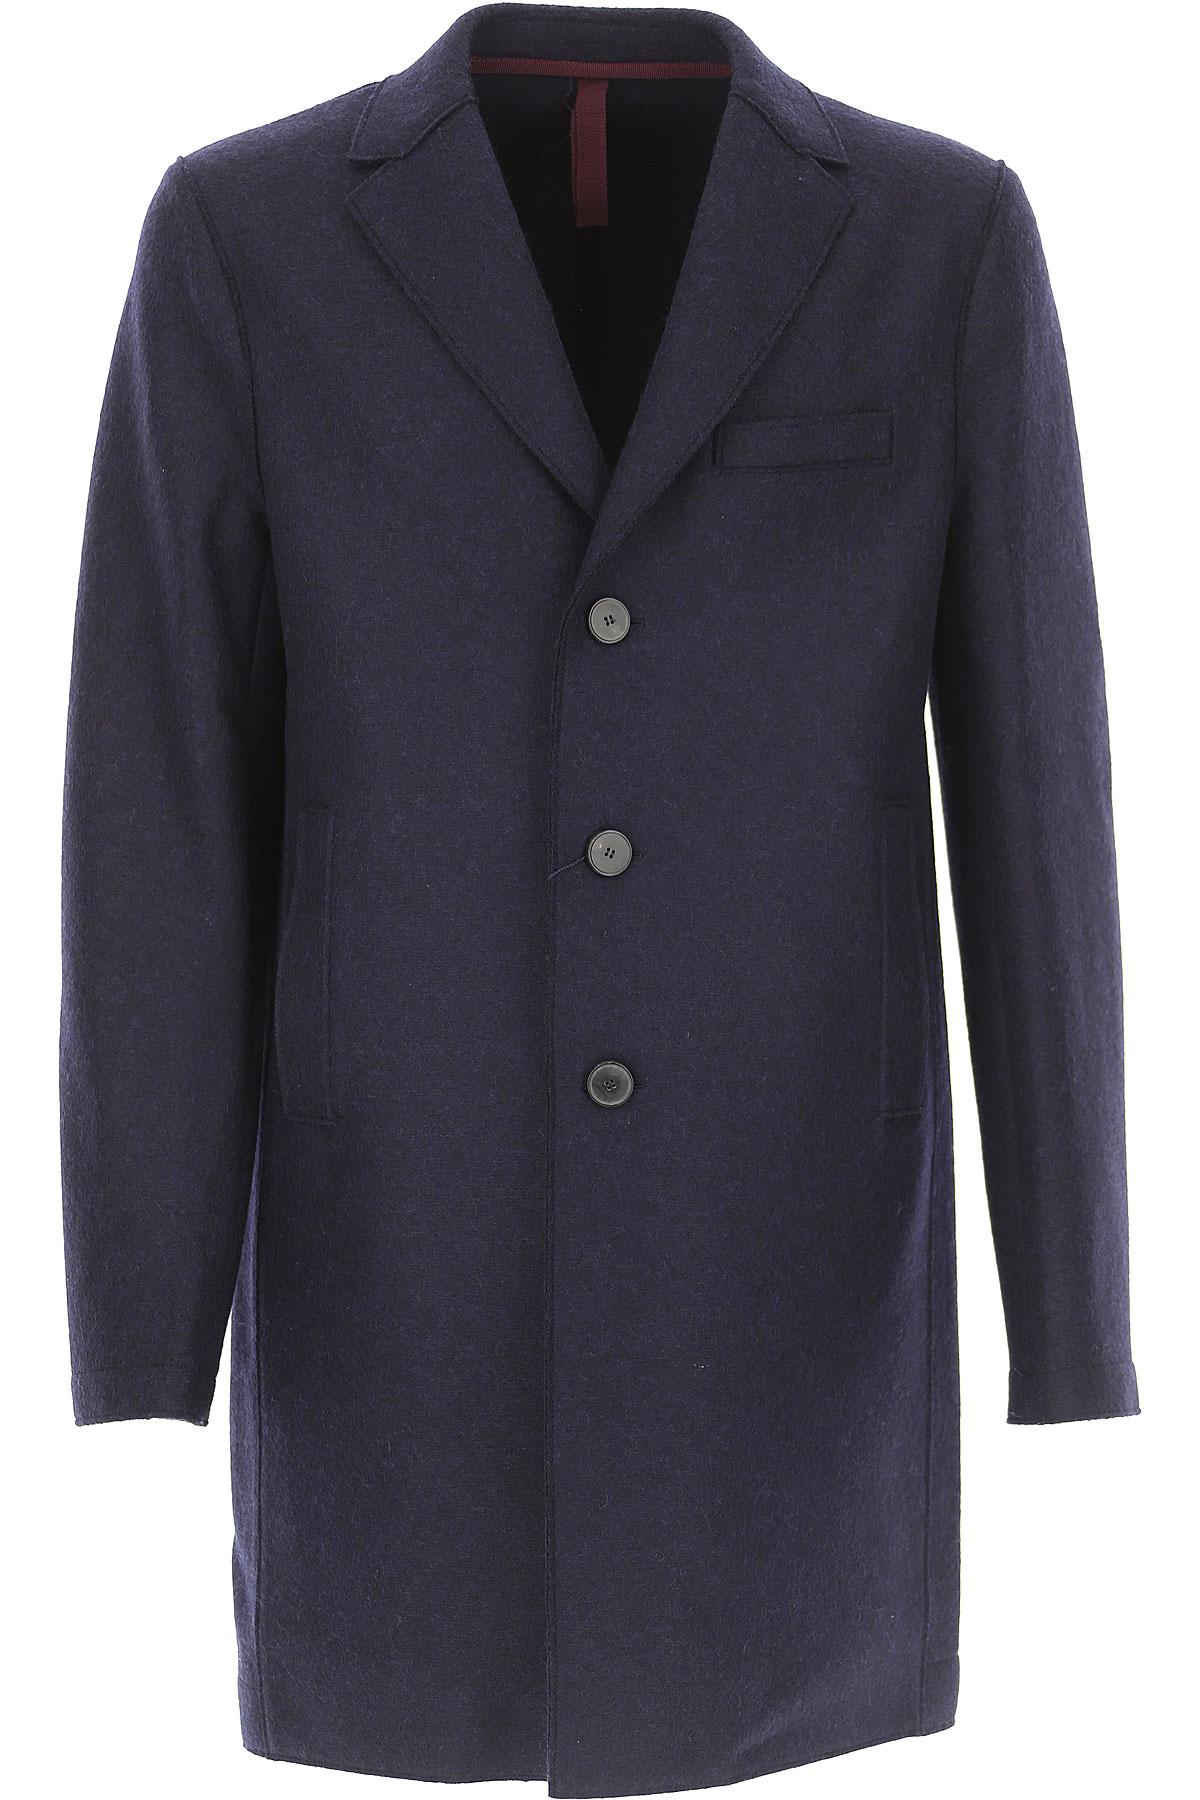 Image of Harris Wharf London Men\'s Coat, Blue Navy, Virgin wool, 2017, L M S XL XXL